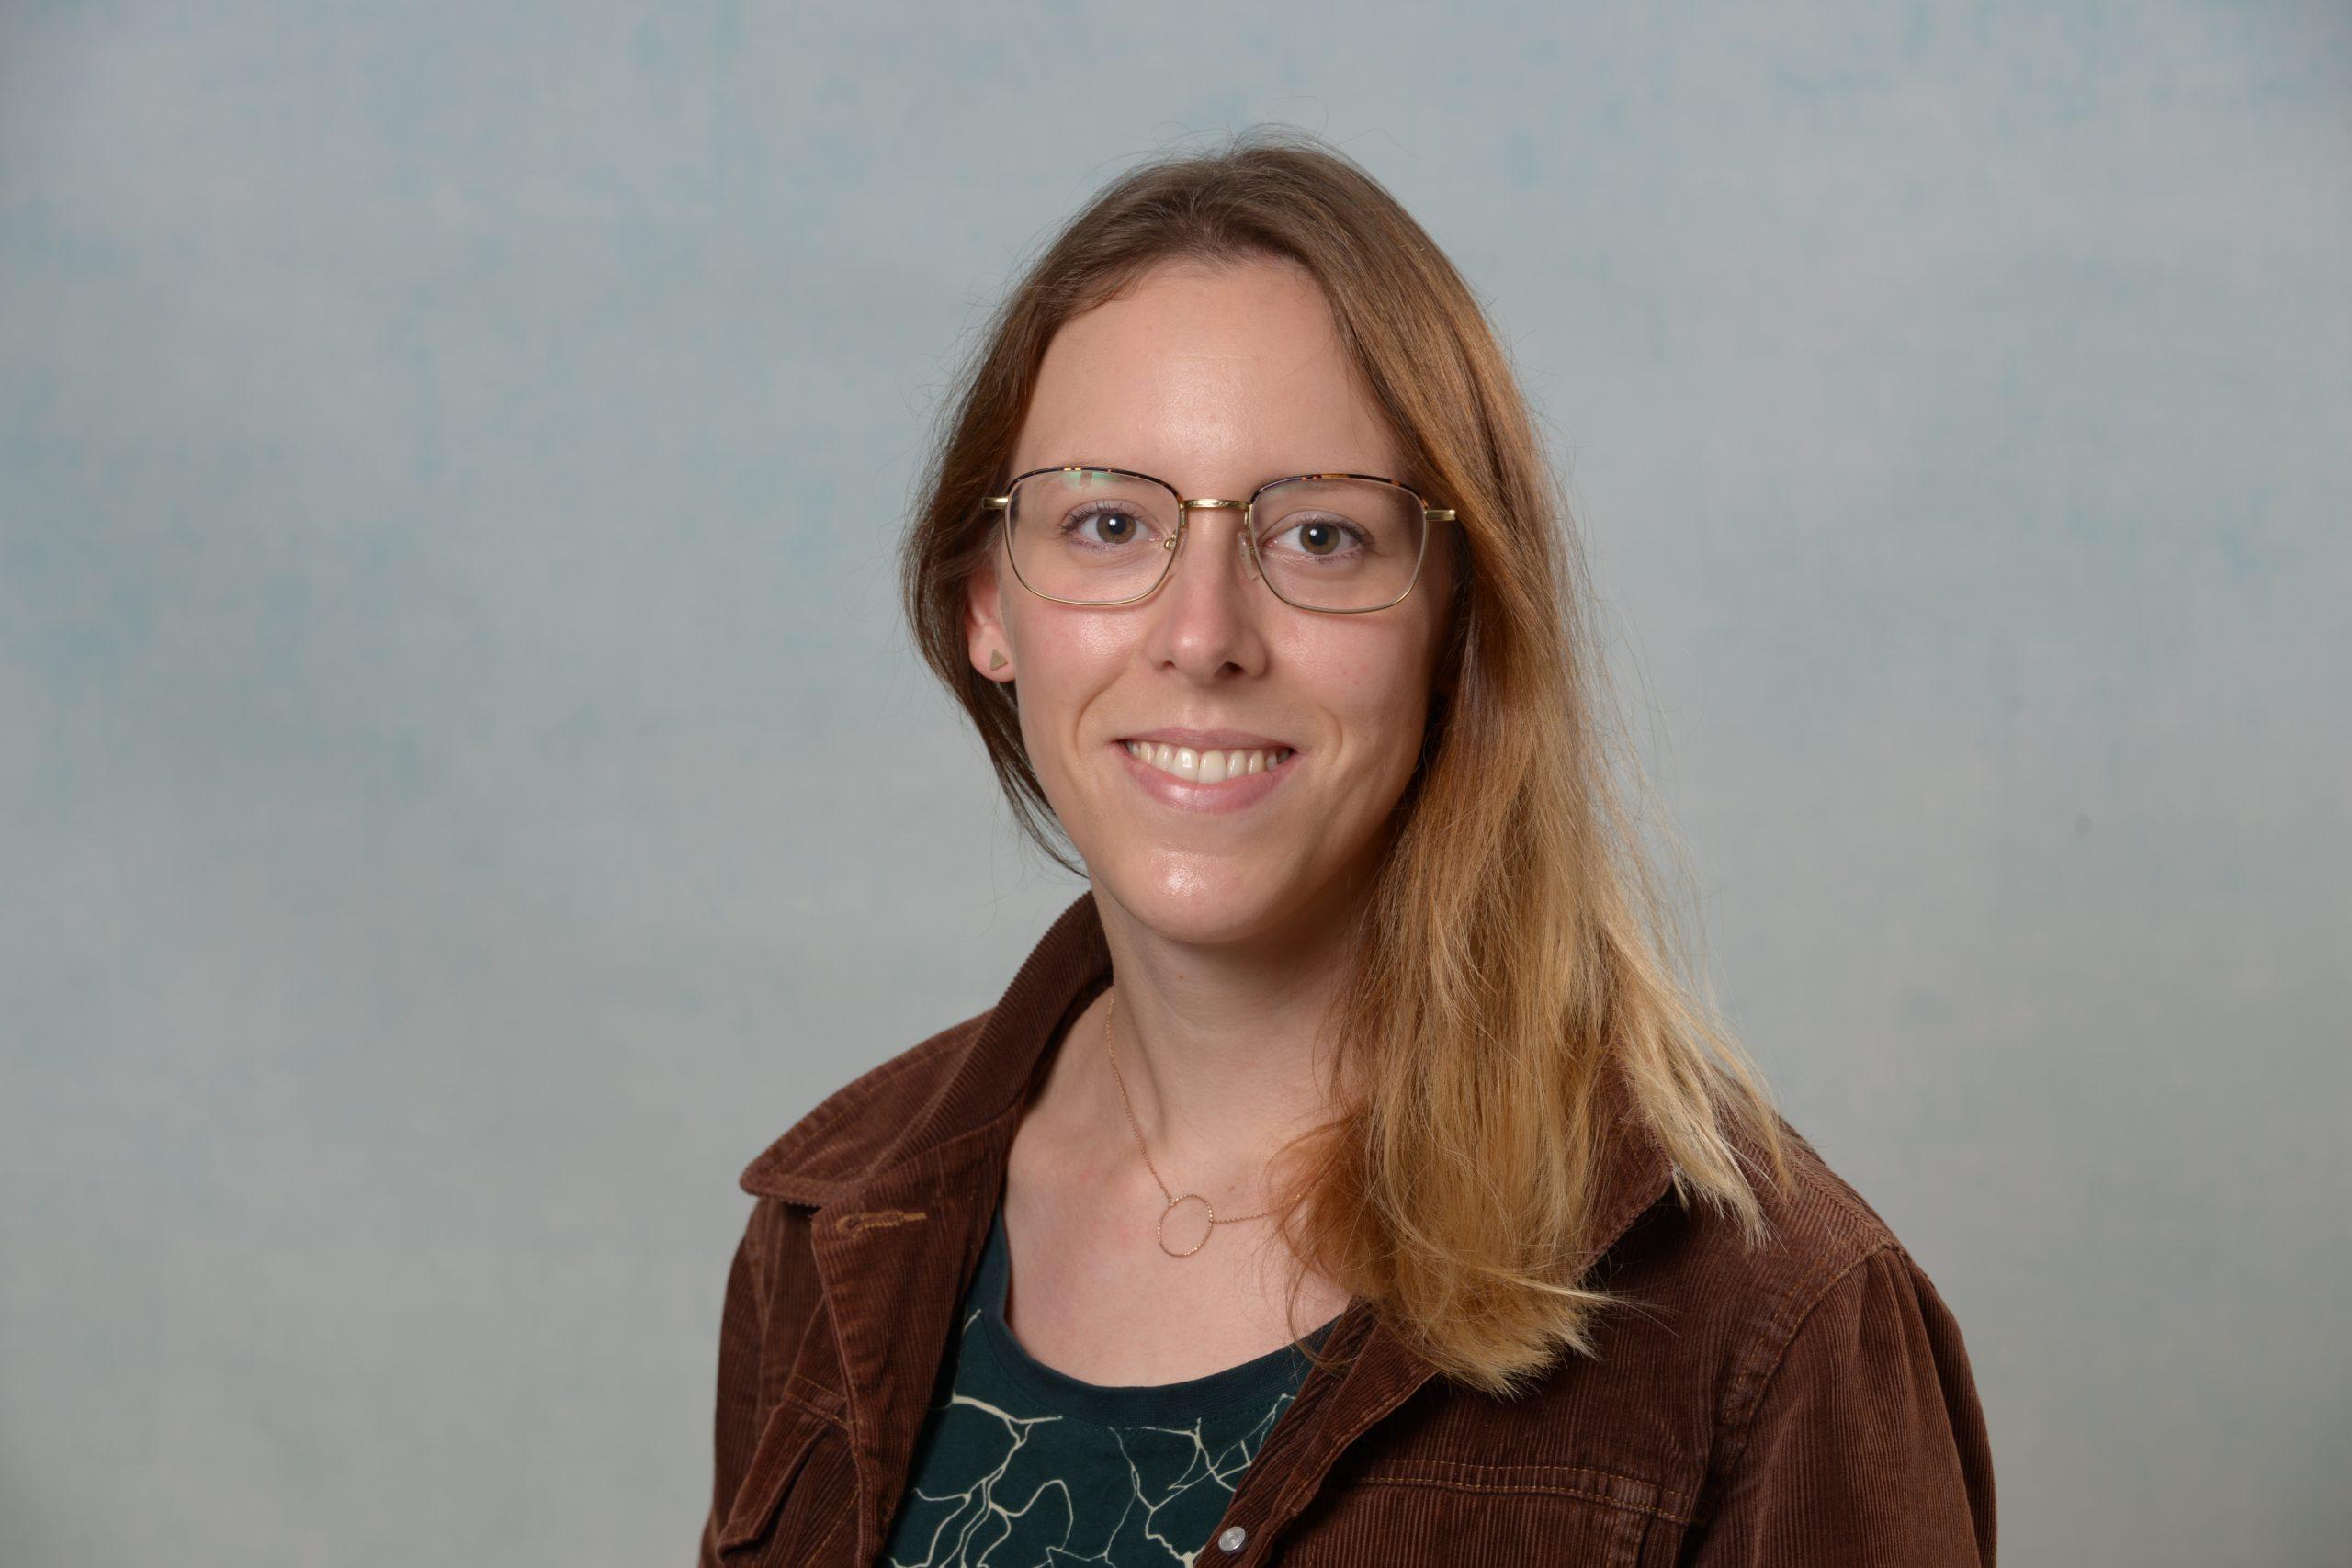 Profilbild von Laura Thome